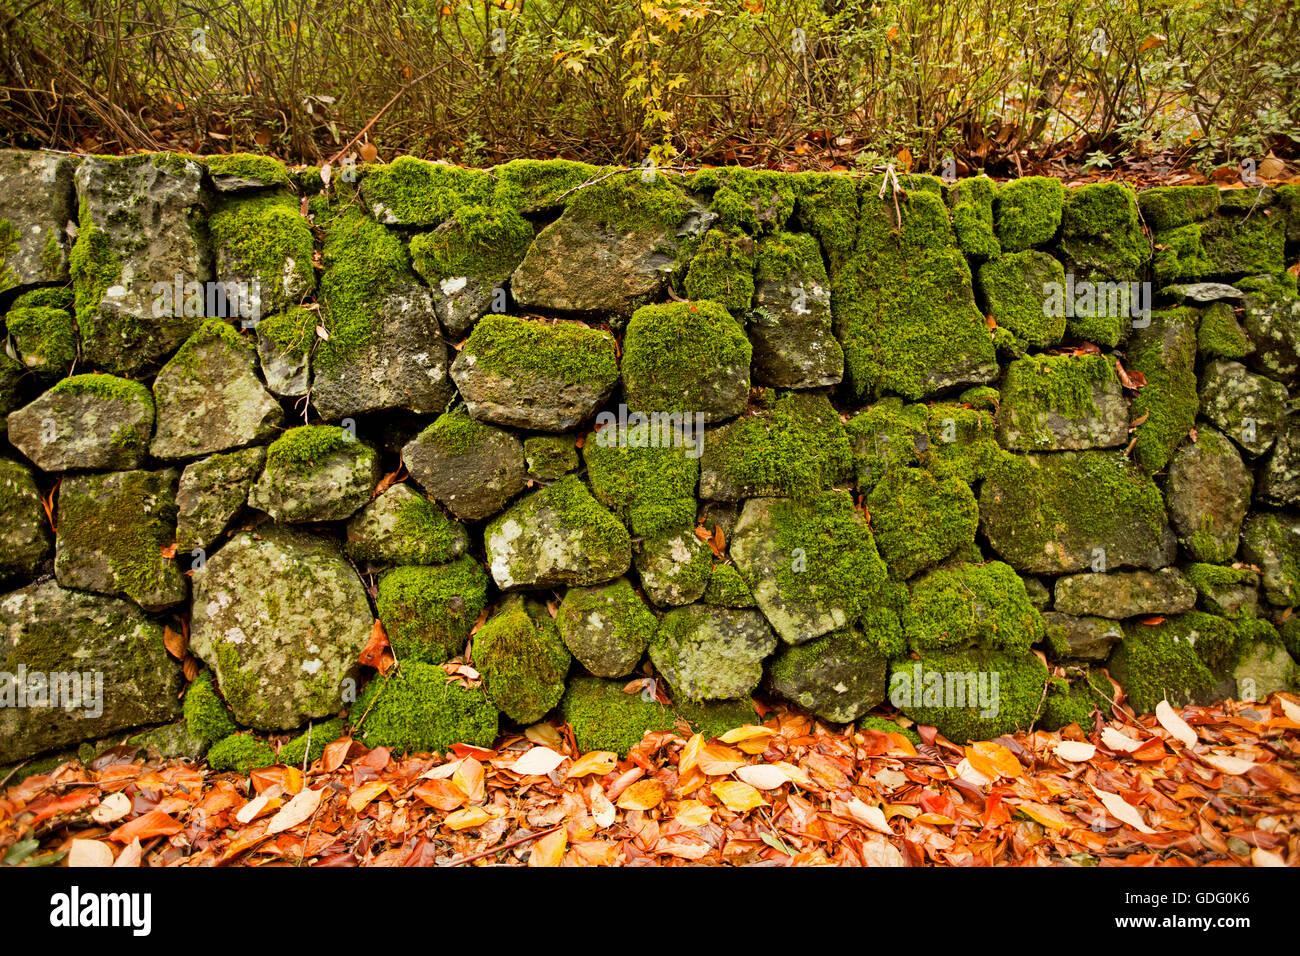 Dry Stone Garden Stock Photos & Dry Stone Garden Stock Images - Alamy